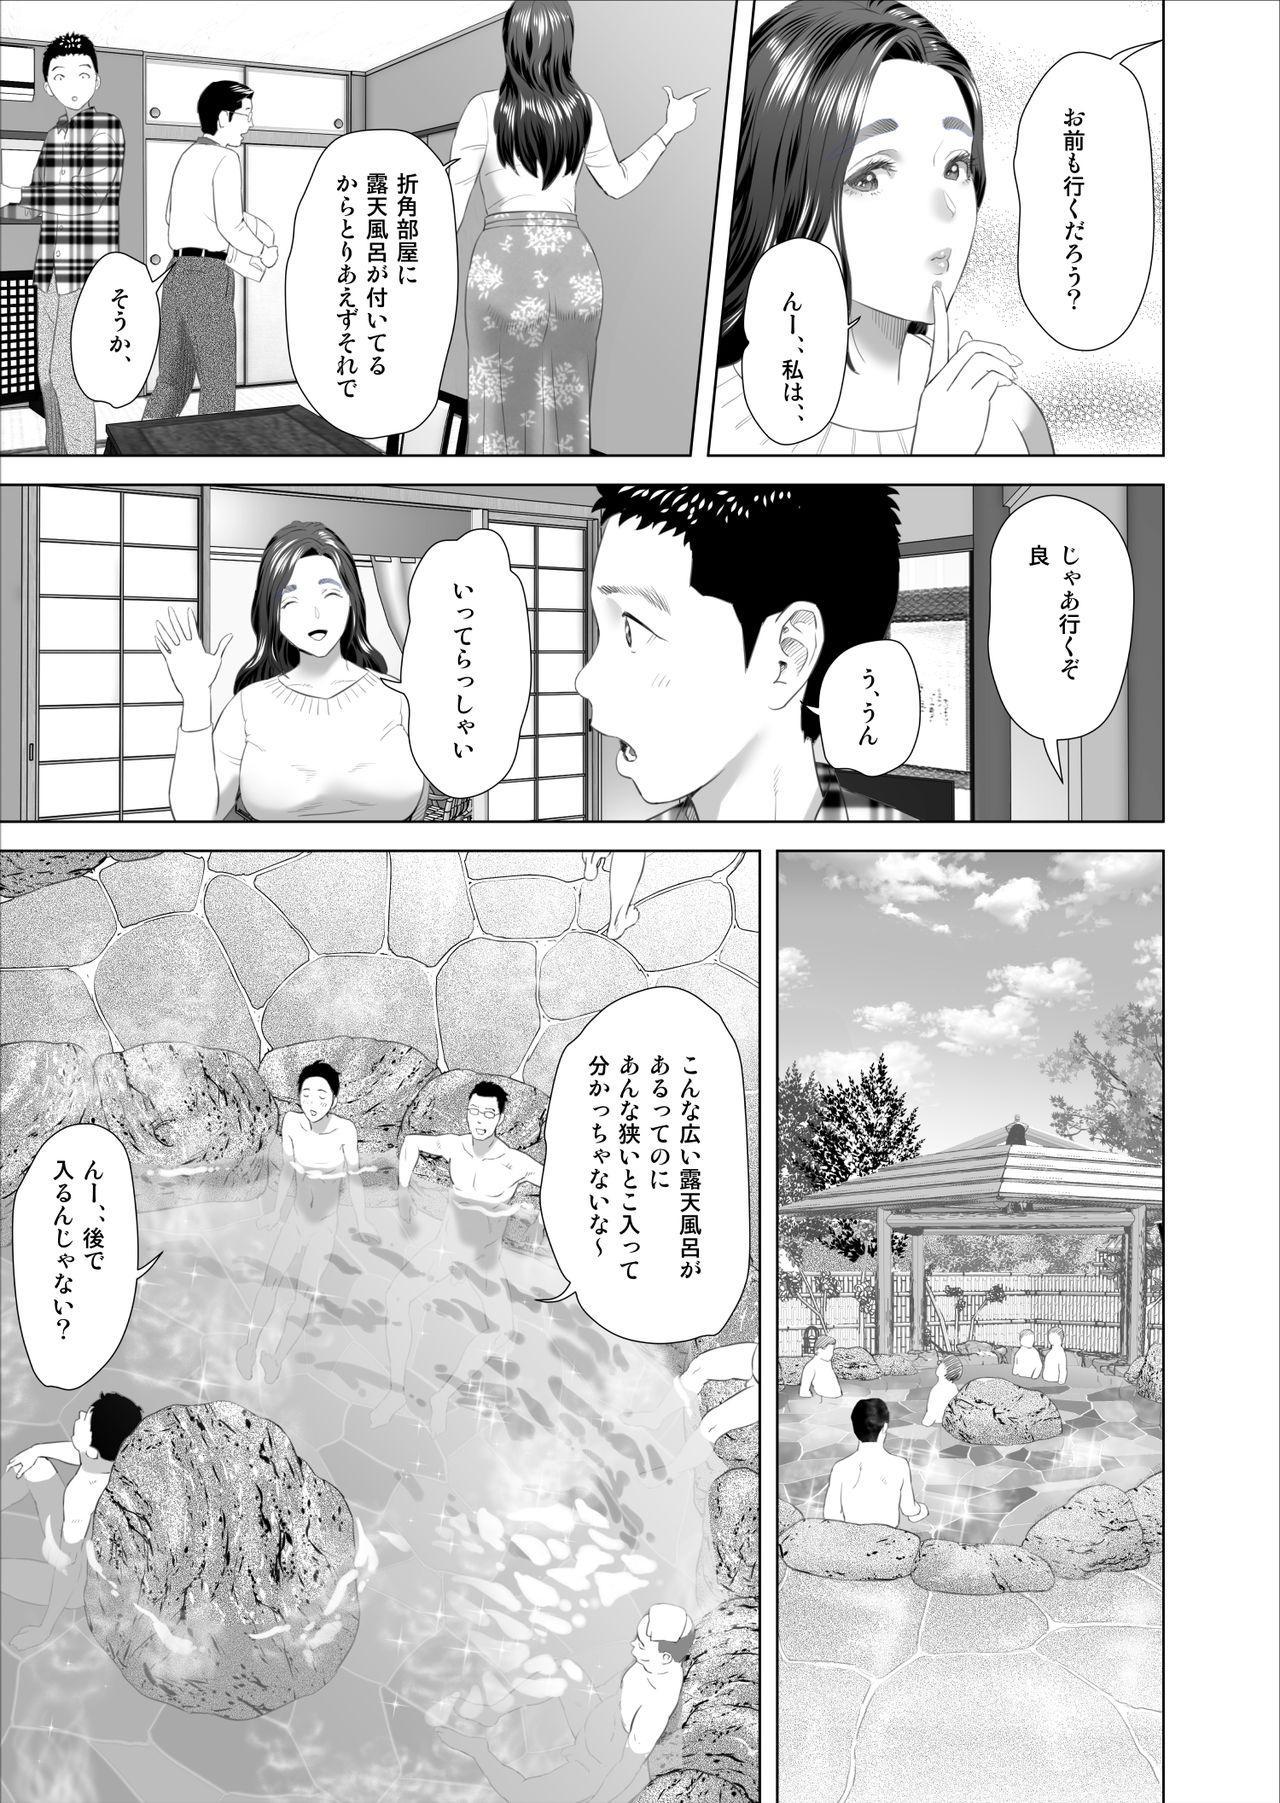 Kinjo Yuuwaku Musuko o Yobai ni Sasou Haha Hen | Neighborhood Seduction Mother Lures Son for a Night Visit! 218